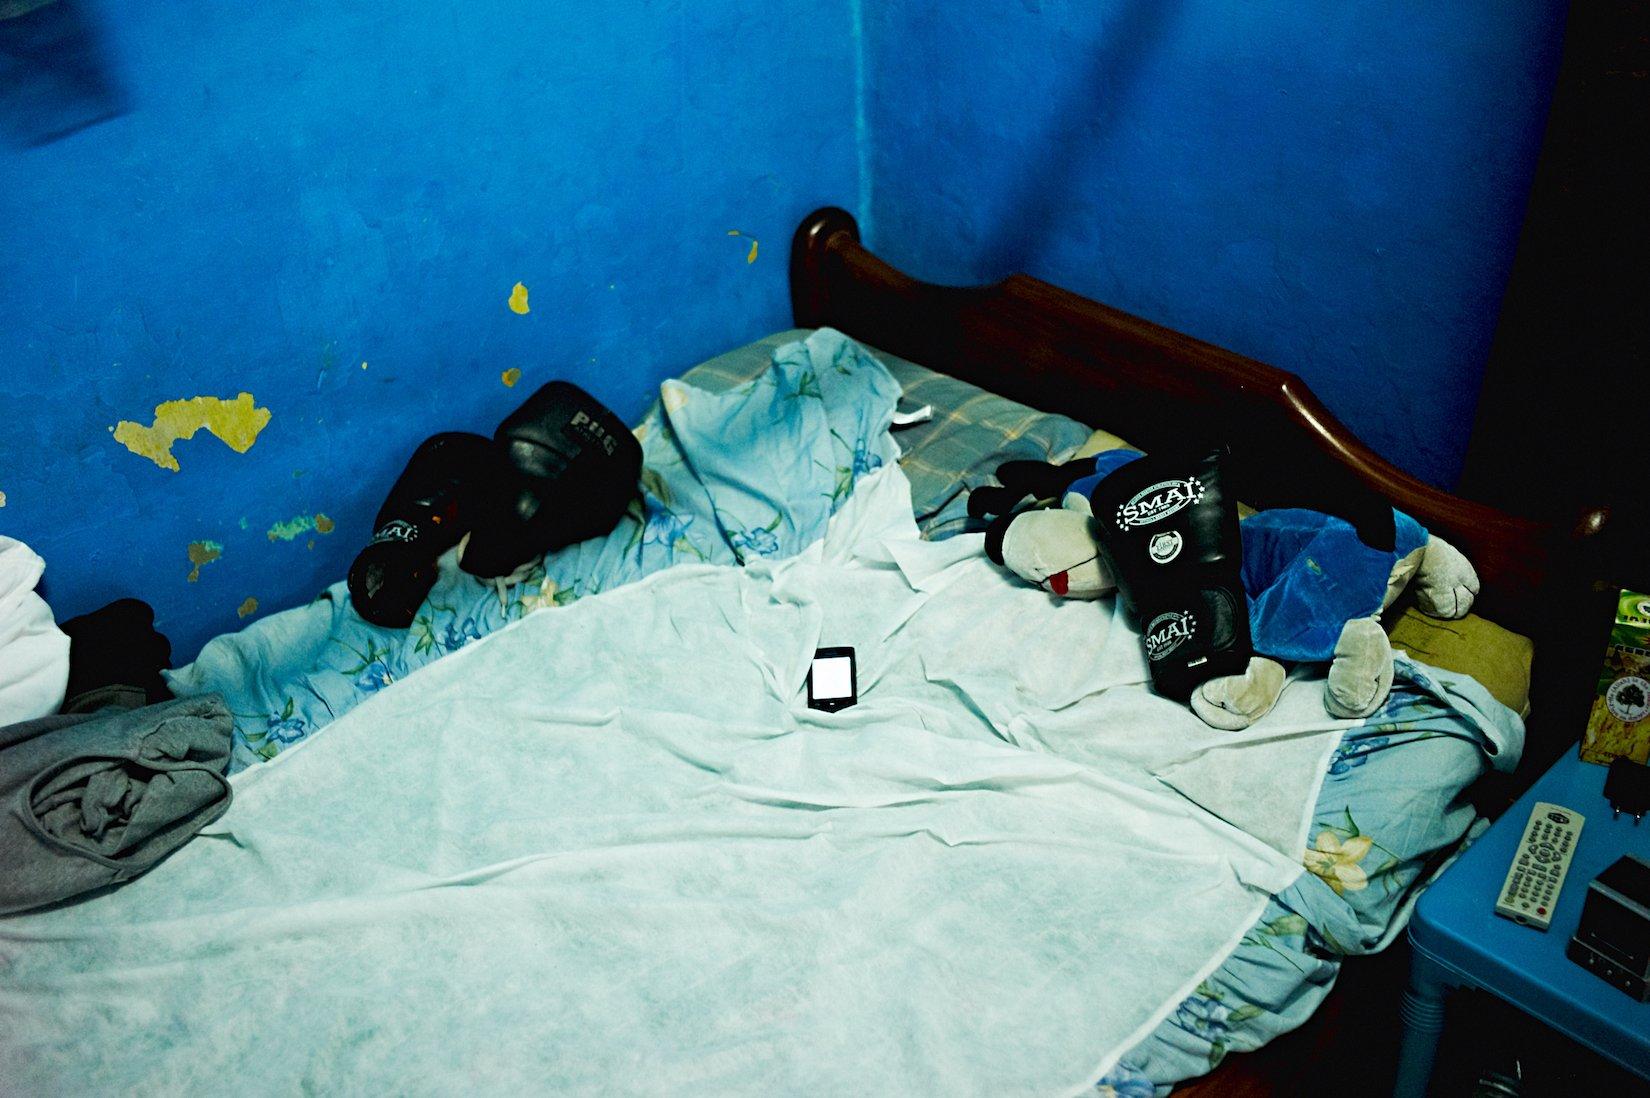 photography_boxersinghana_andreasjakwerth_22